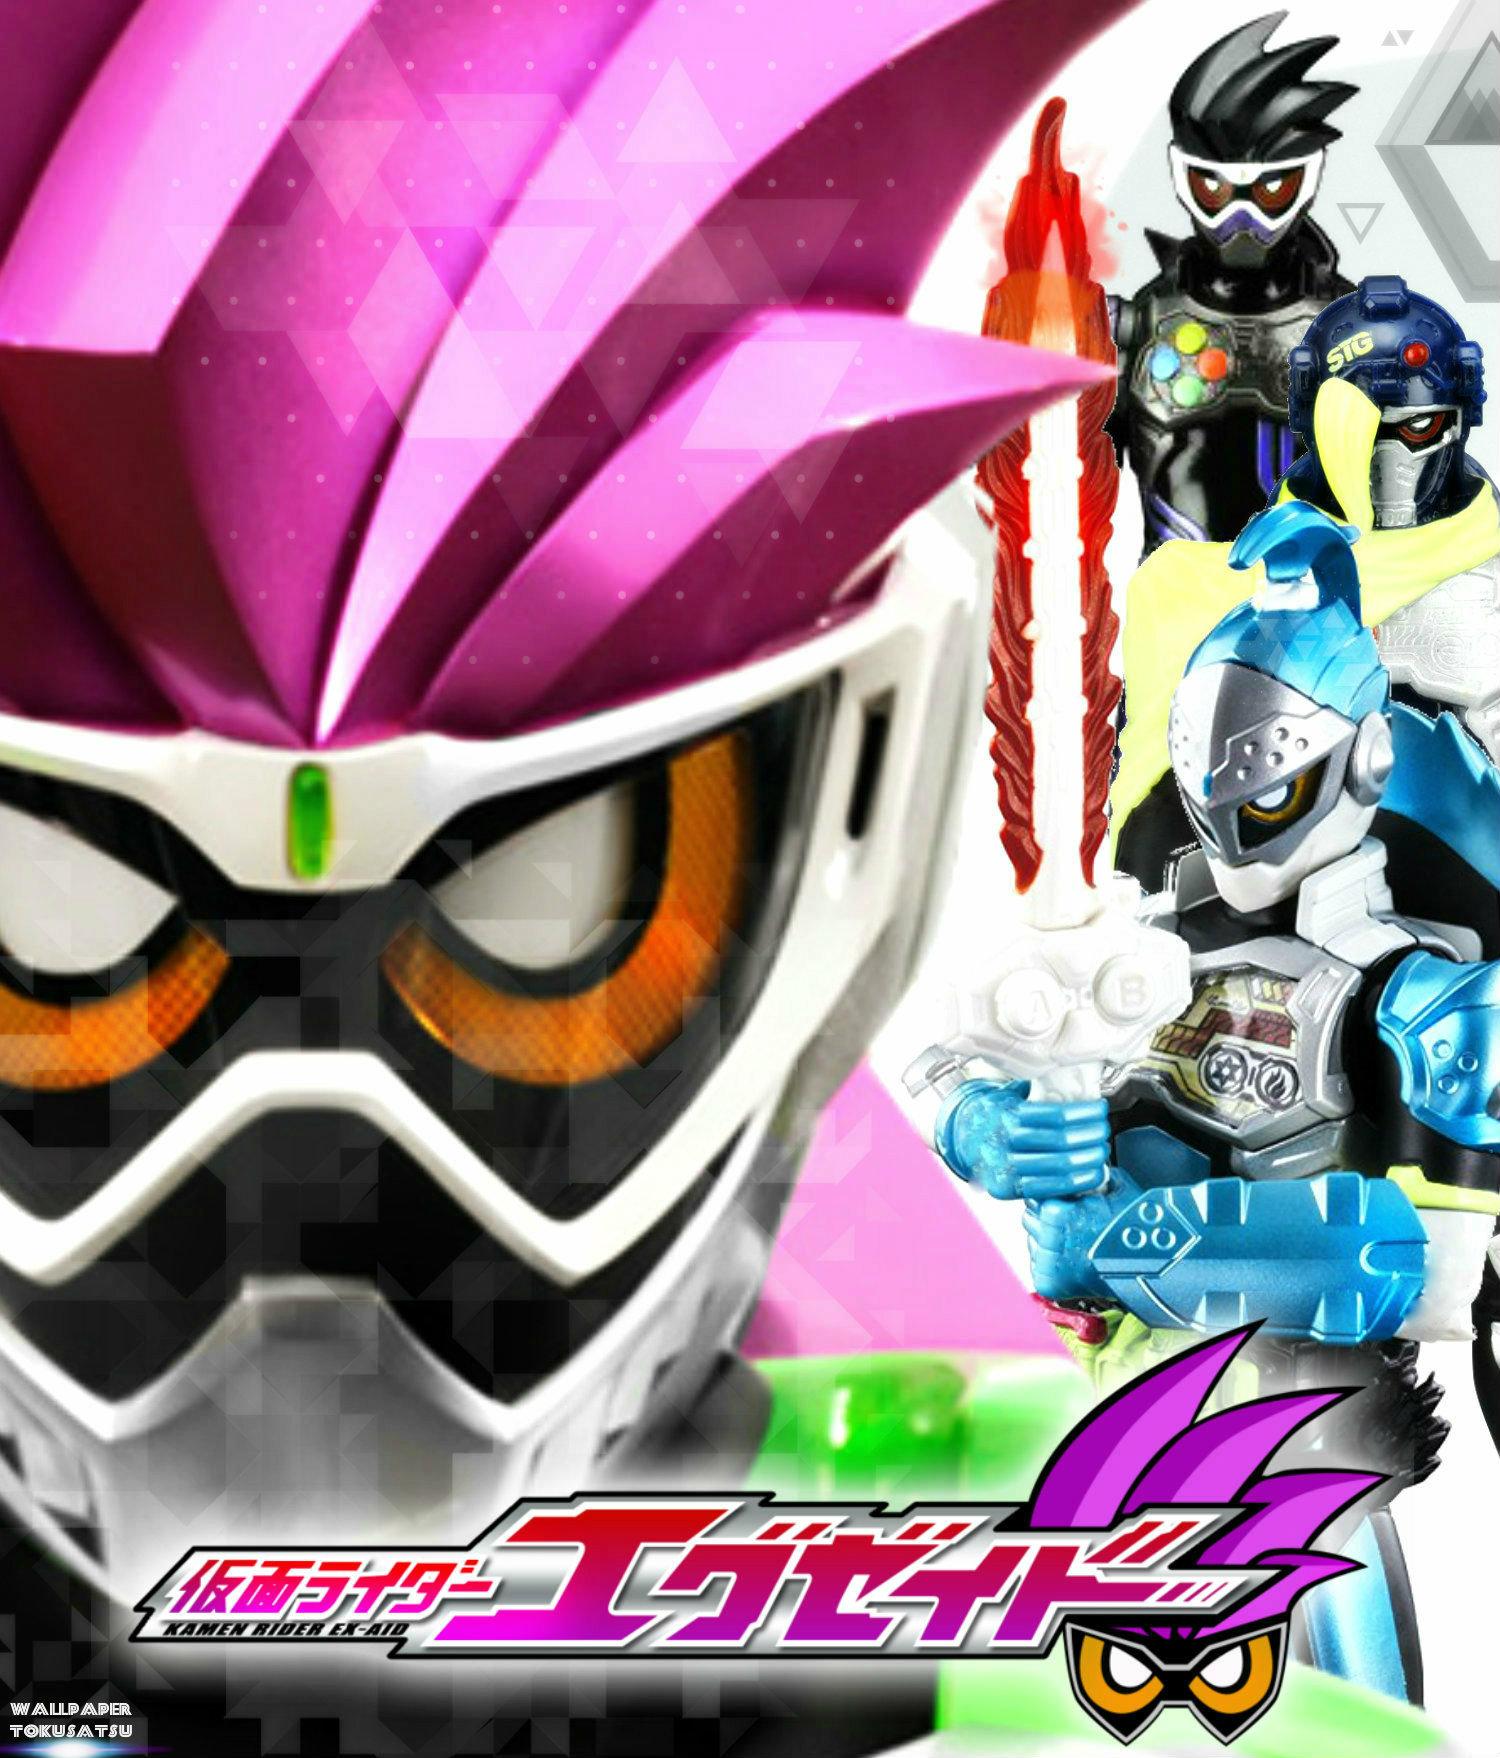 [SPECIAL] Kamen Rider Ex-Aid (2016) Virtual Operations